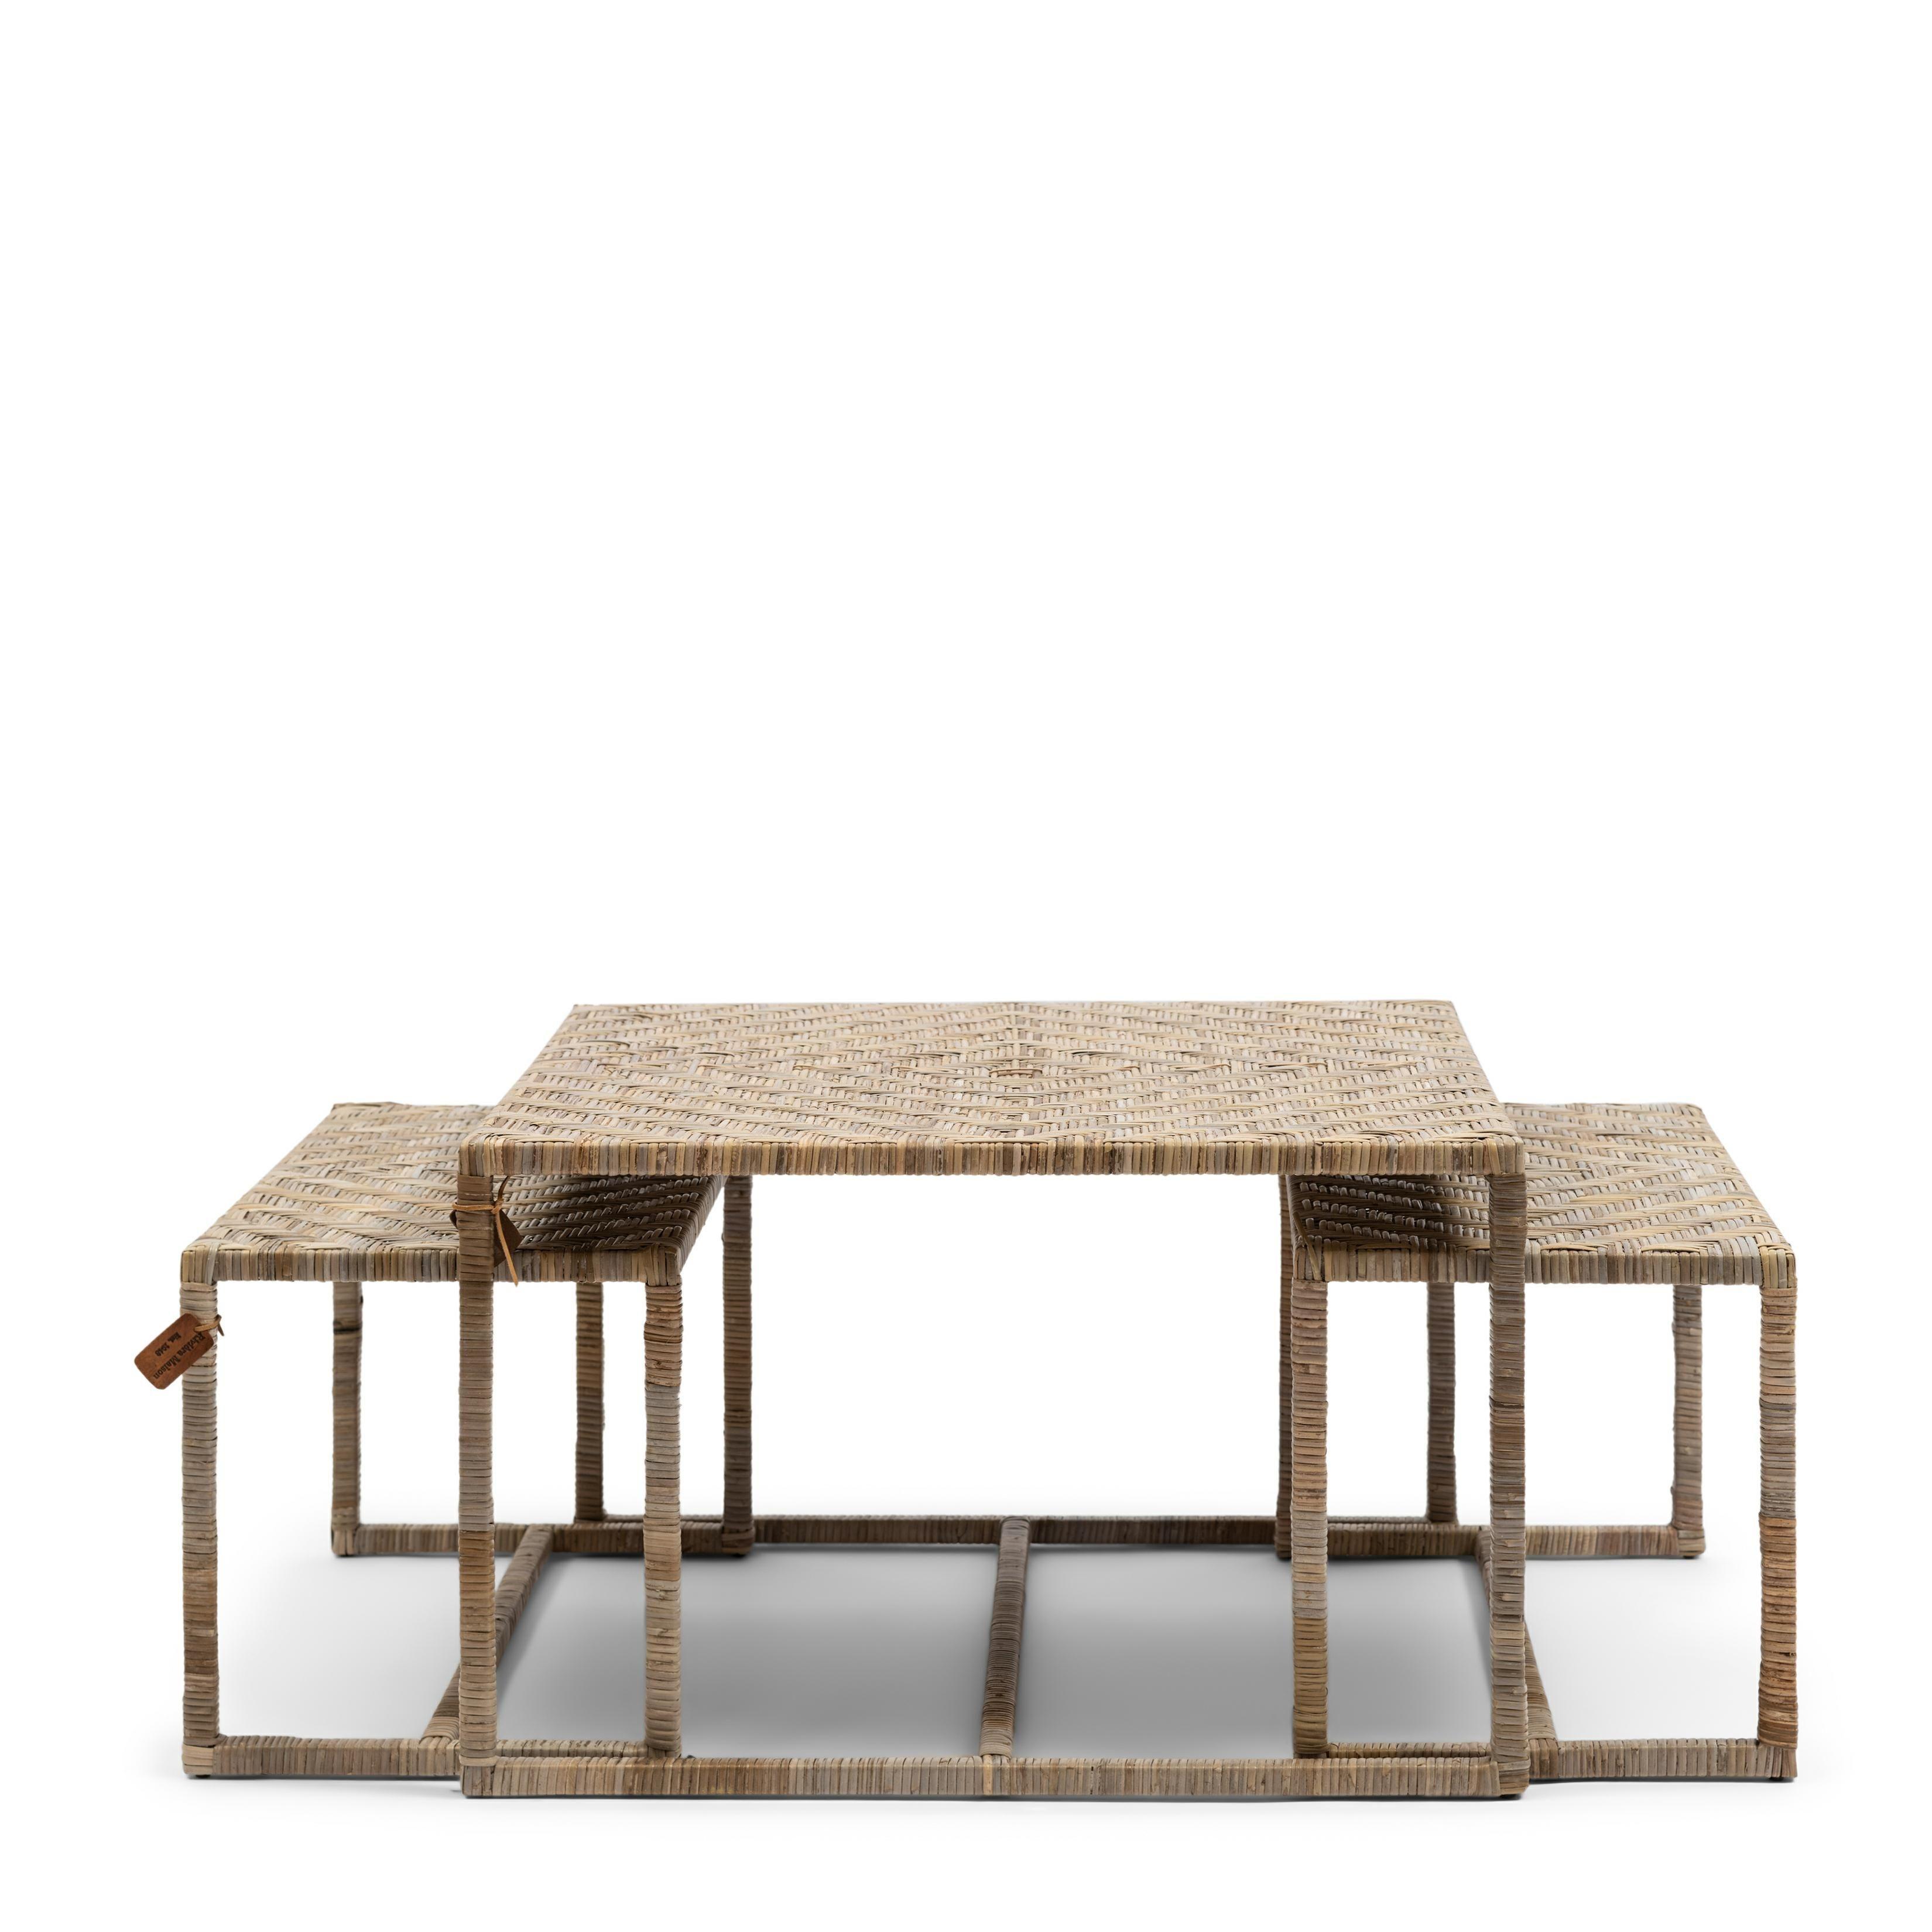 Medan Coffee Table Set 3 / Rivièra Maison